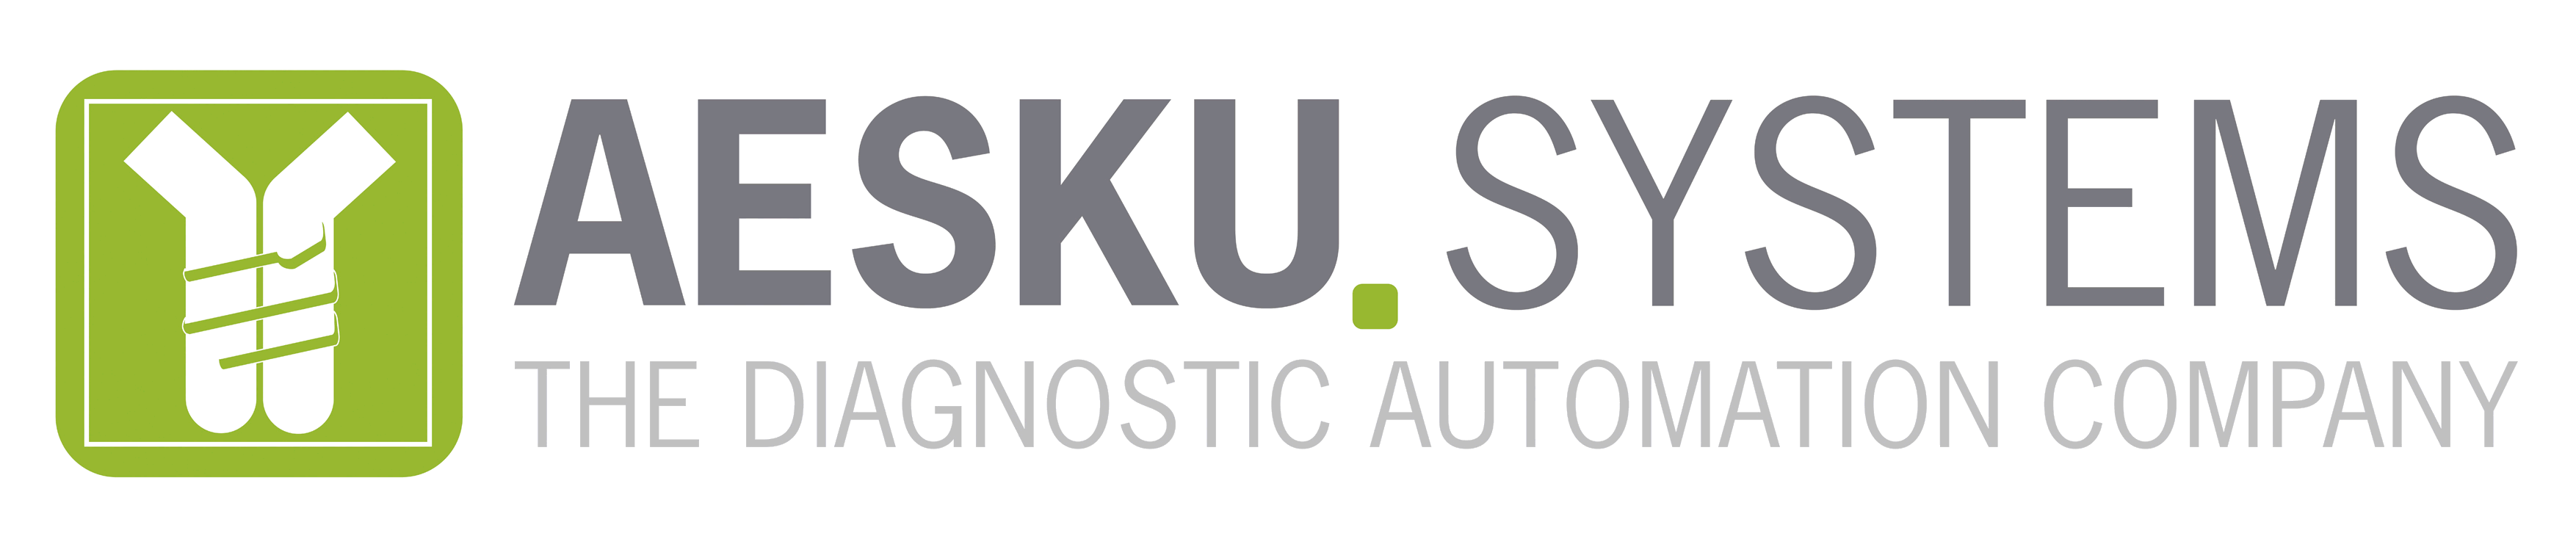 AESKU.Systems